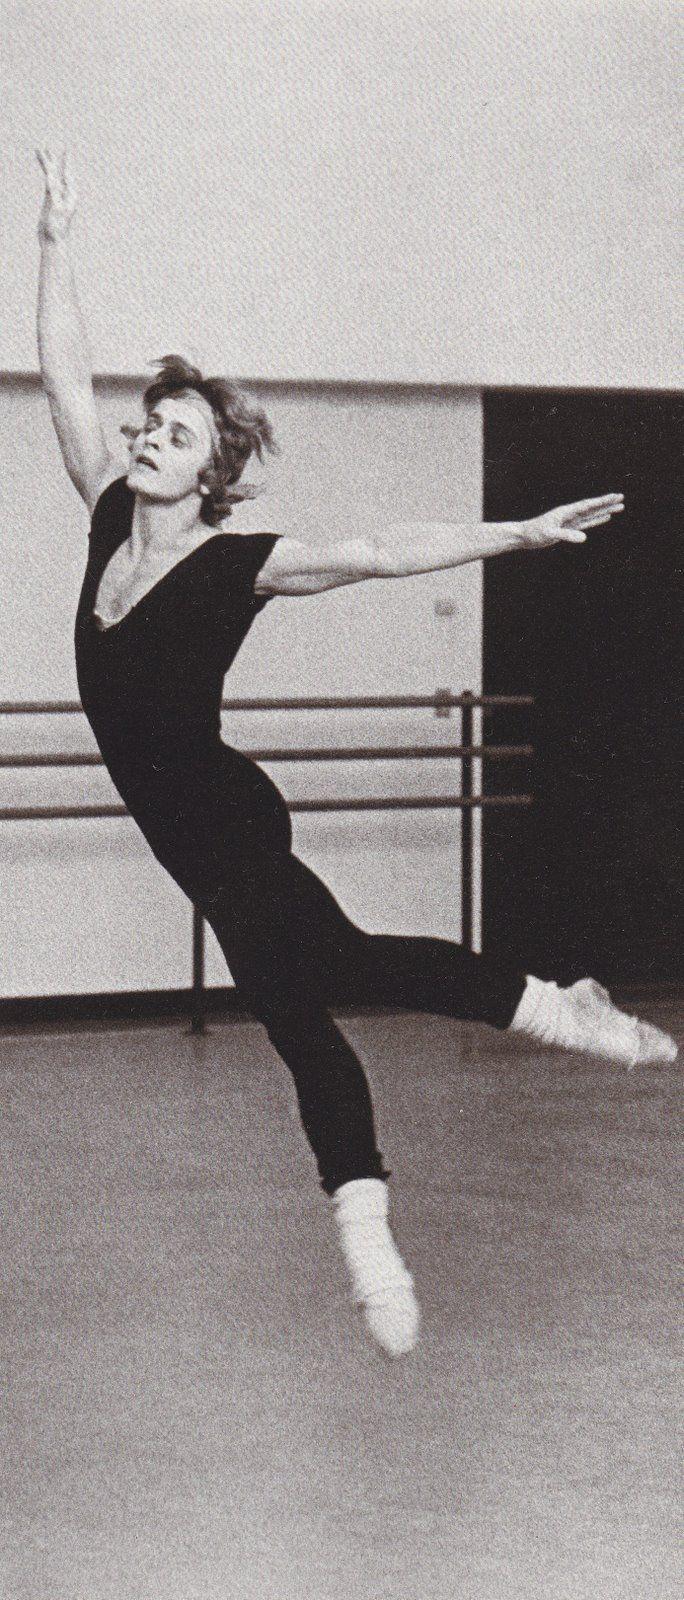 Mikhail Baryshnikov rehearsing 'Other Dances', 1976